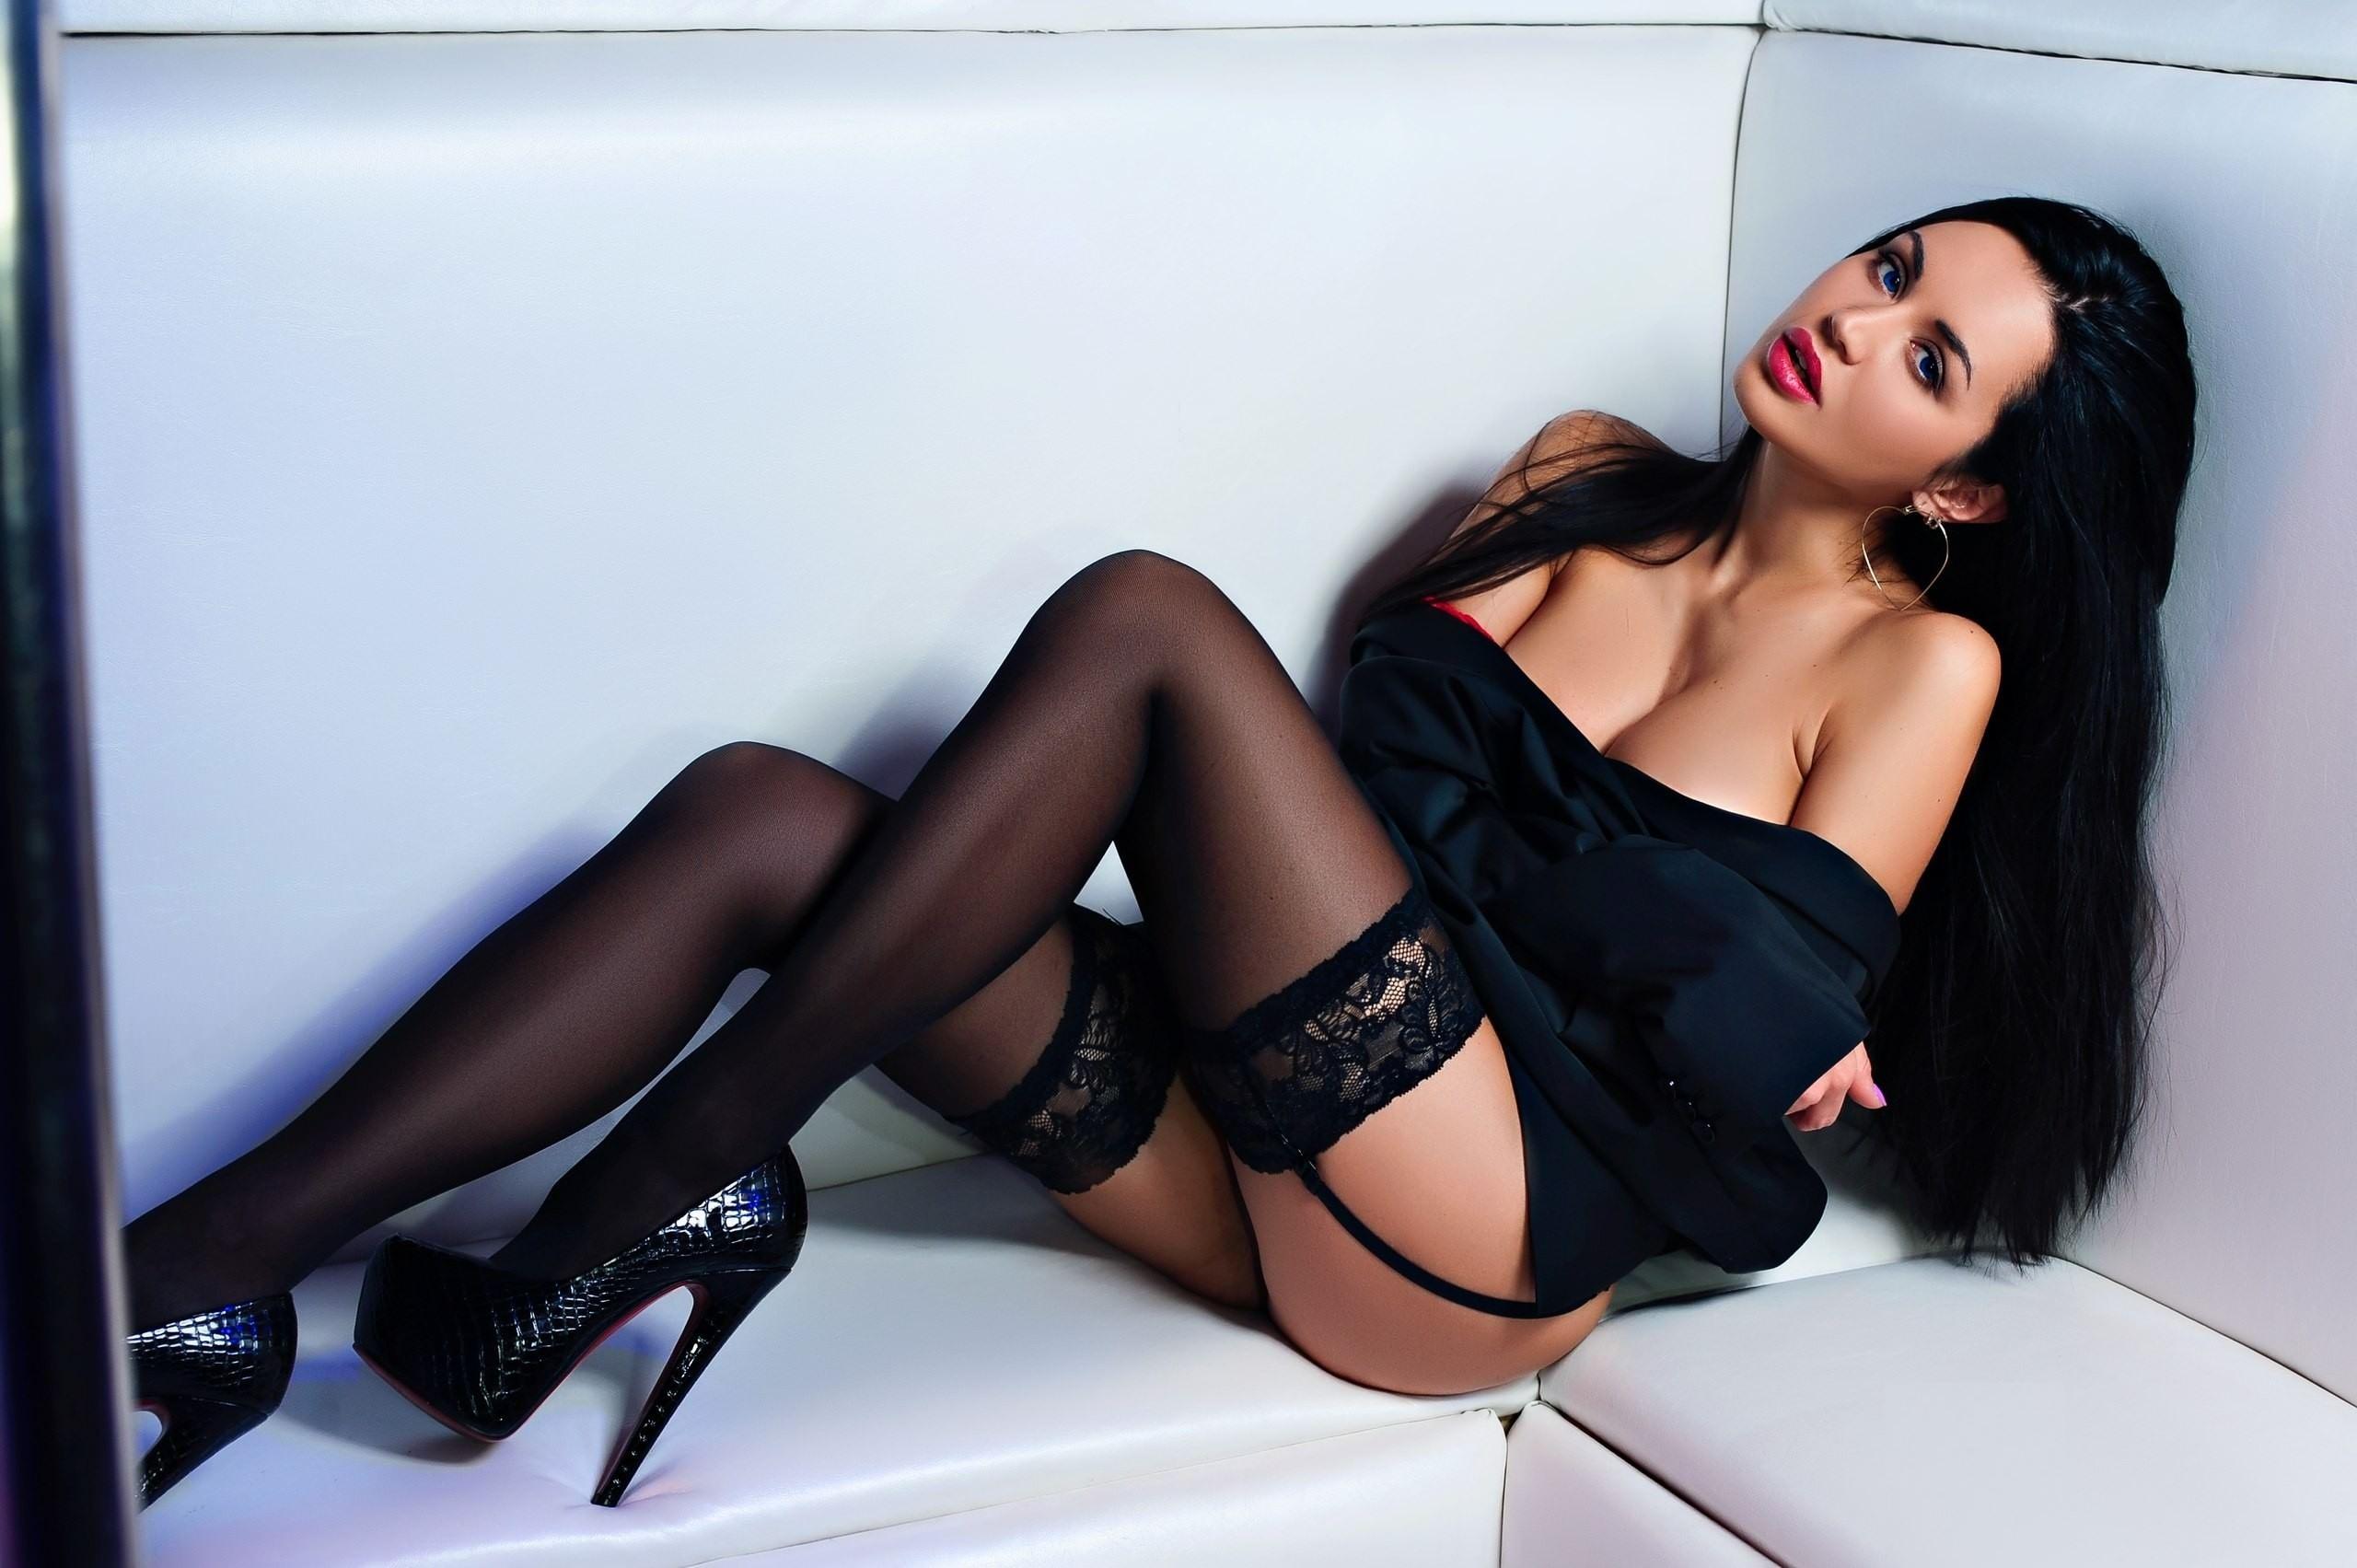 Sexy jumpsuit lingerie women sexy women black lace fishnet rhinestone lingerie bodysuit off